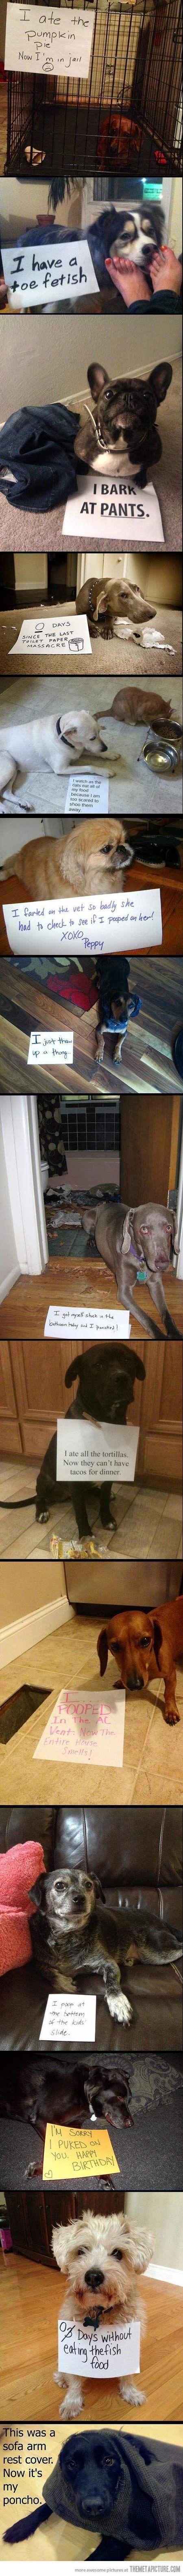 ha! dogs